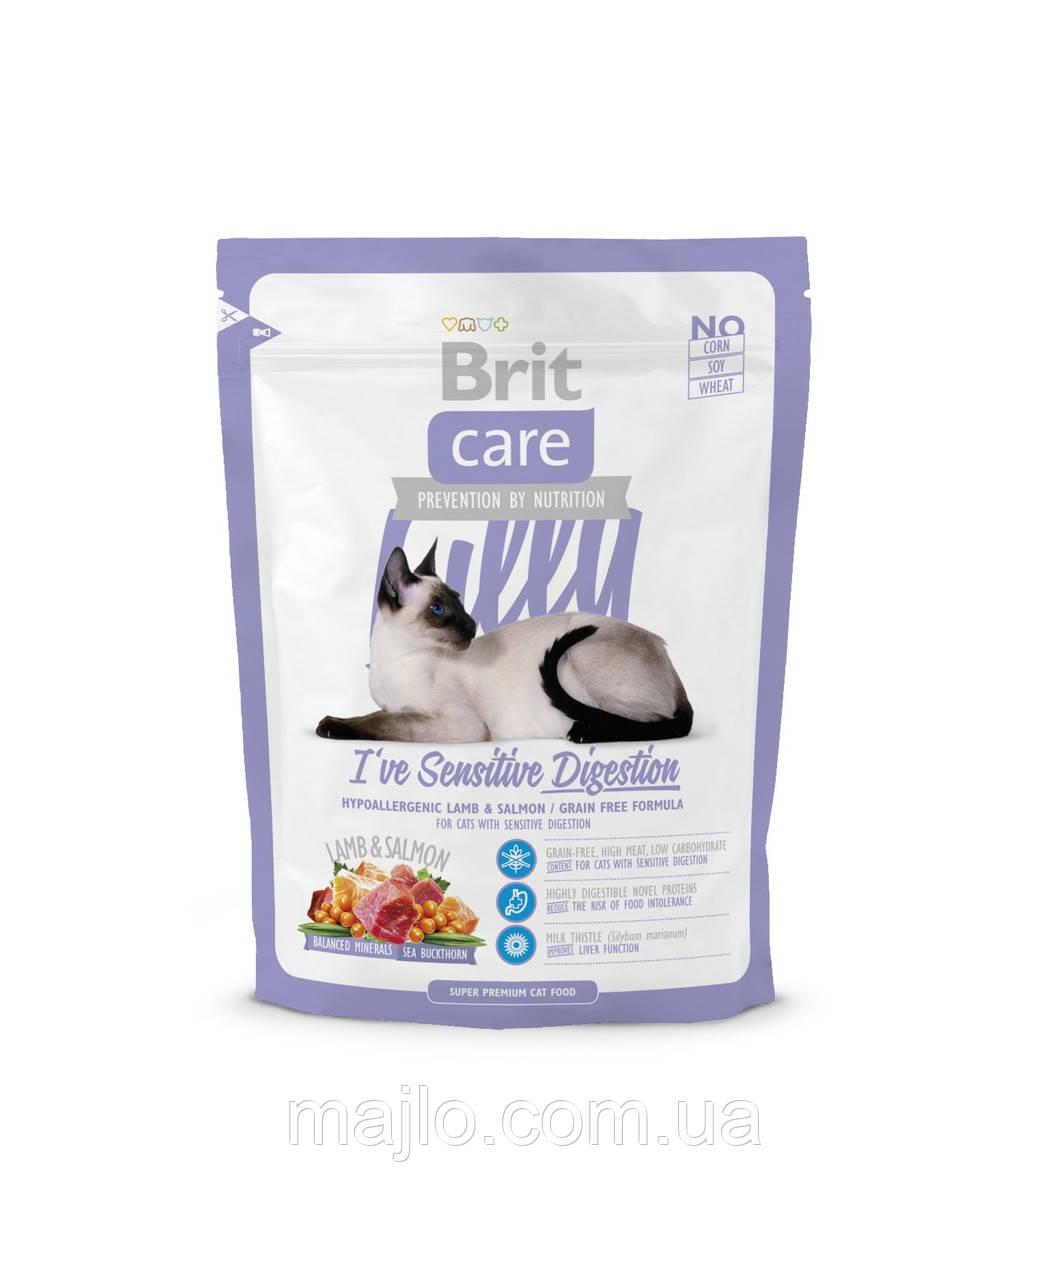 Сухий корм Brit Care Cat Lilly Sensitive Digestion Брит Кеа беззерновой для кішок з чутливим